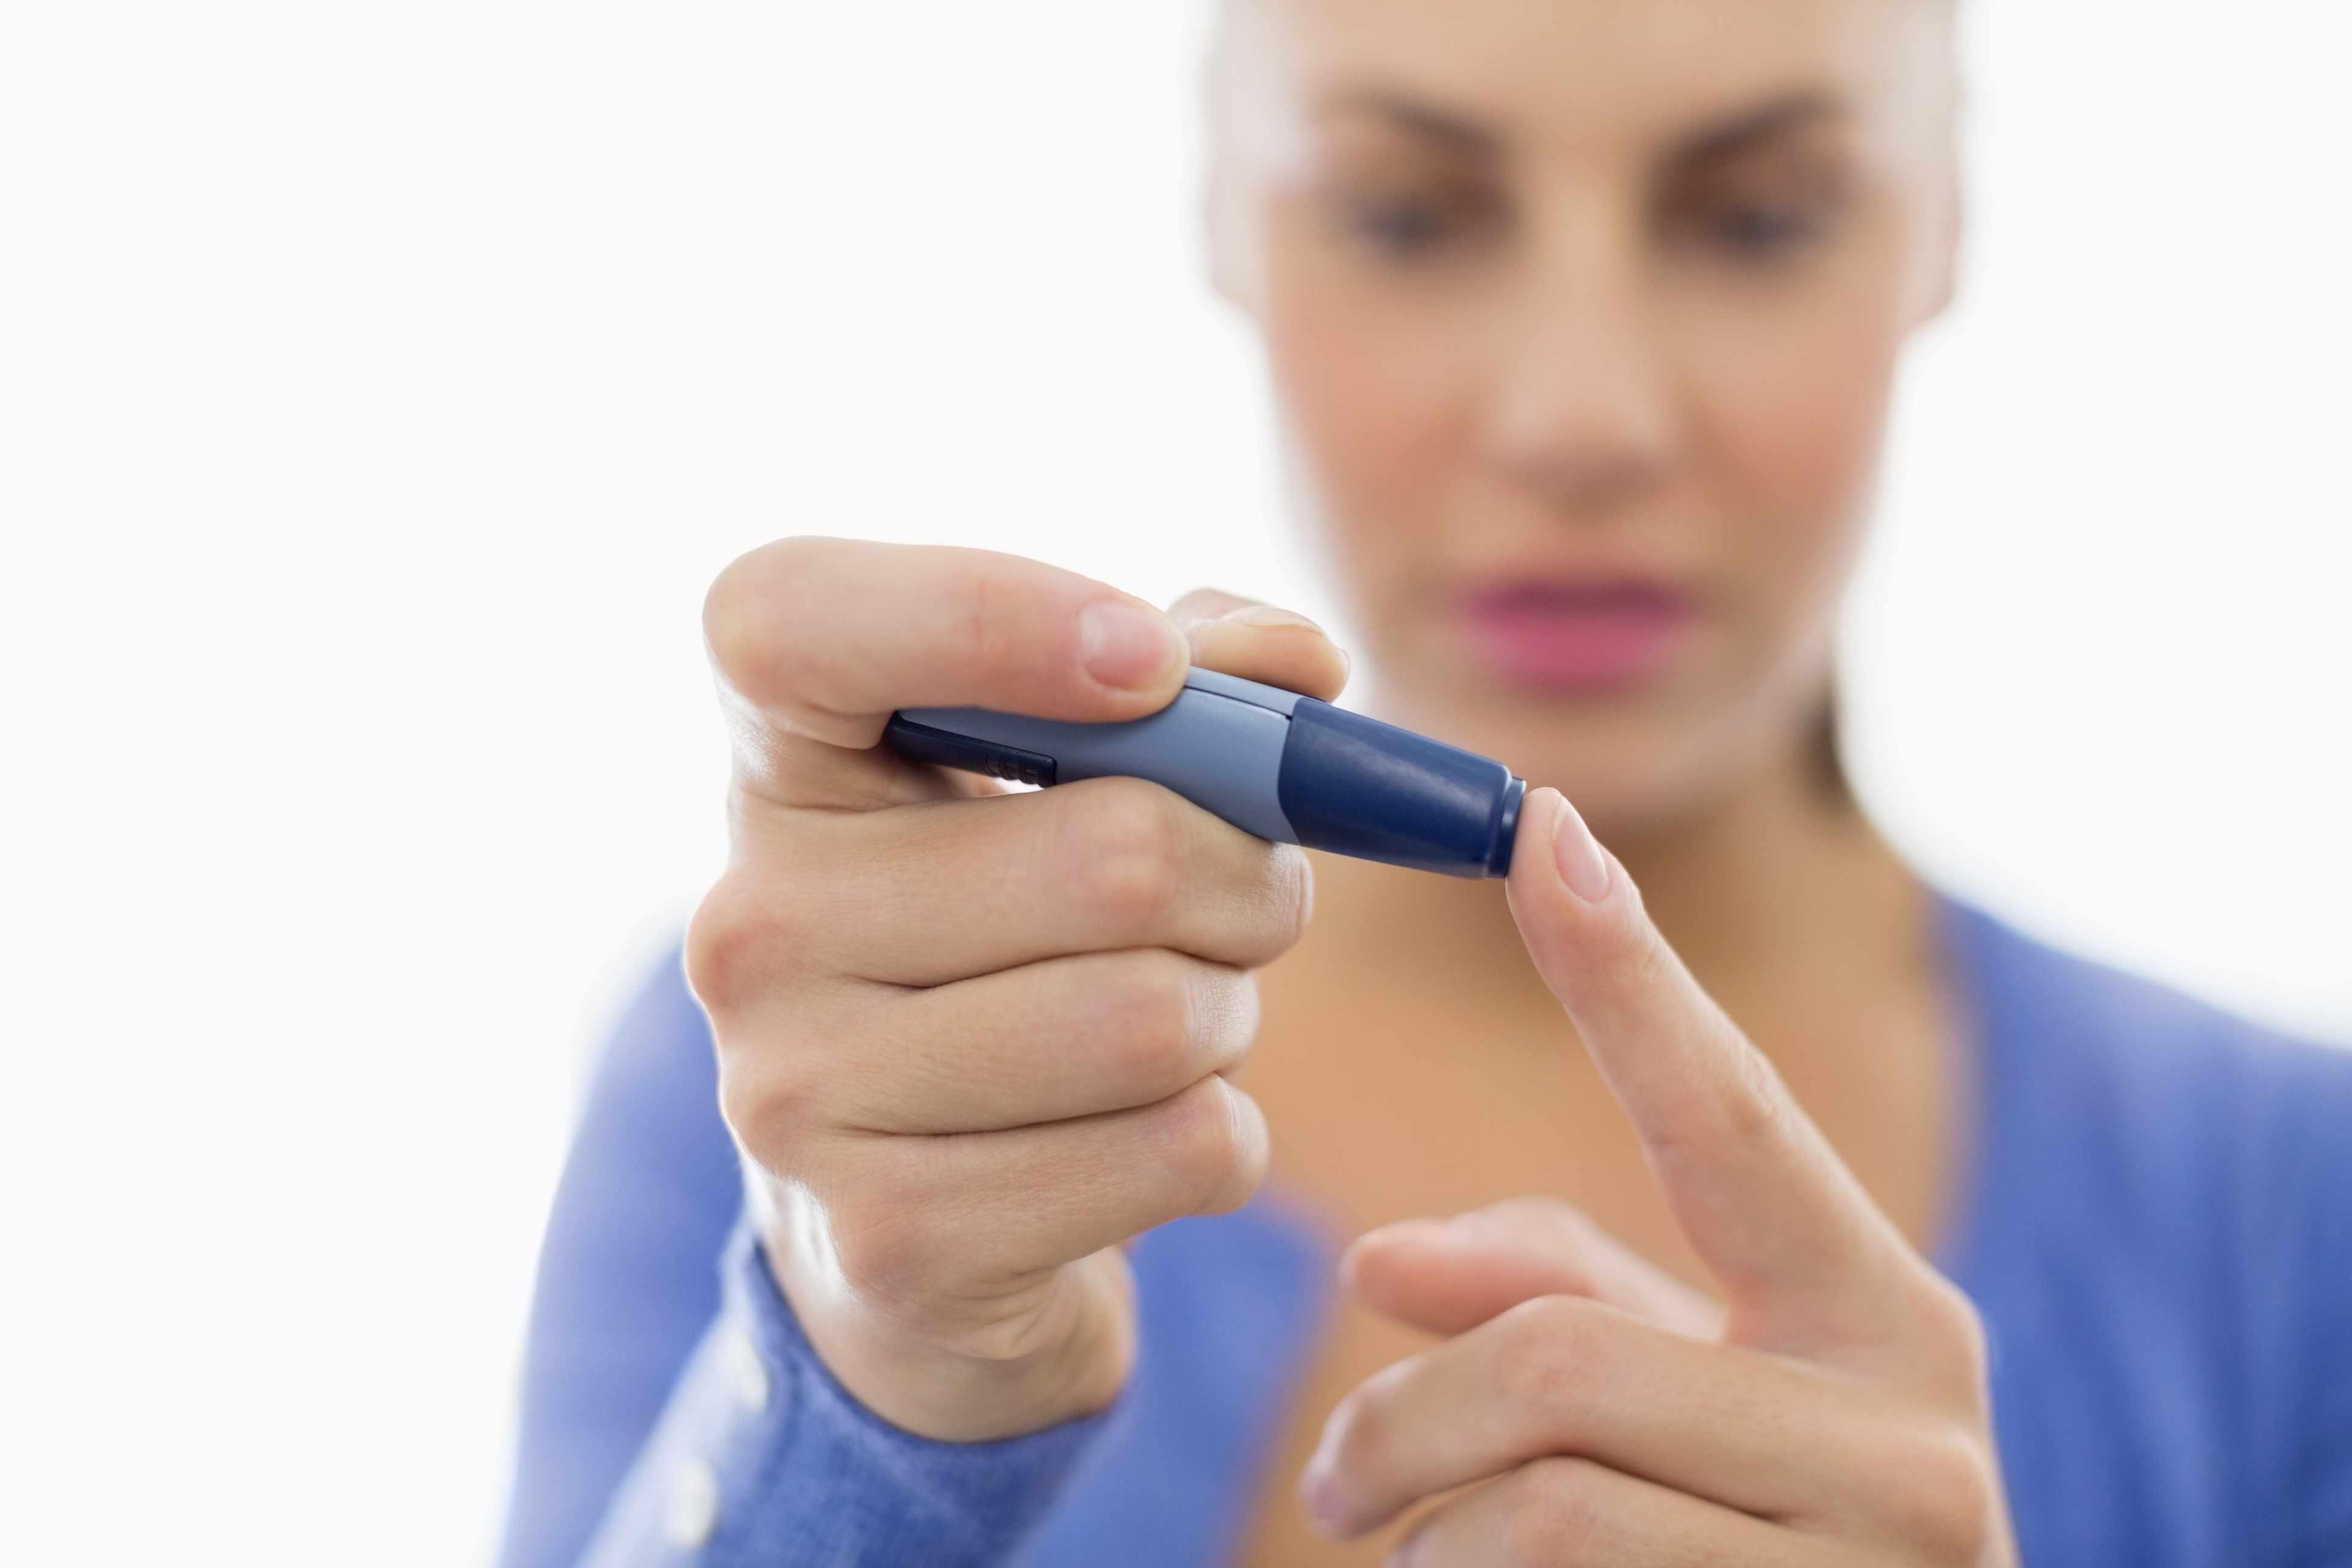 Woman testing her blood sugar